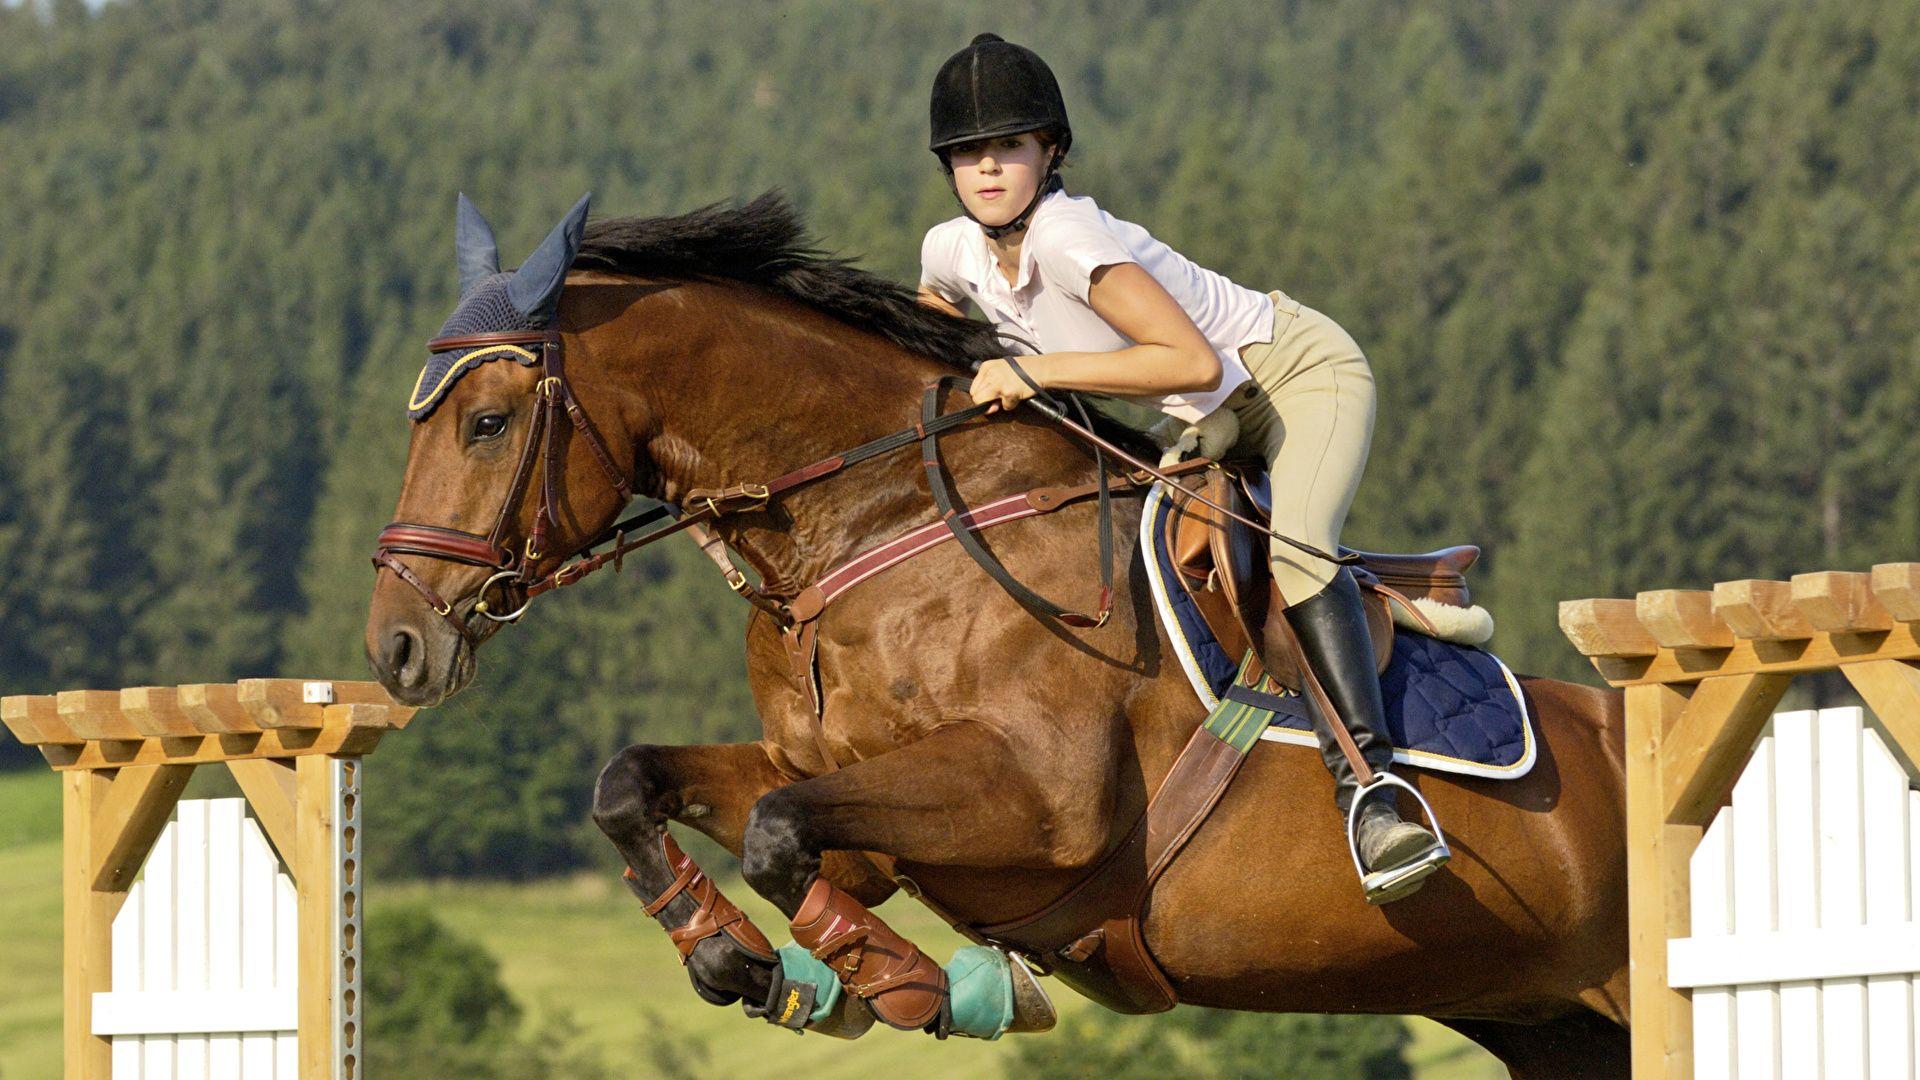 Equestrian download wallpaper image